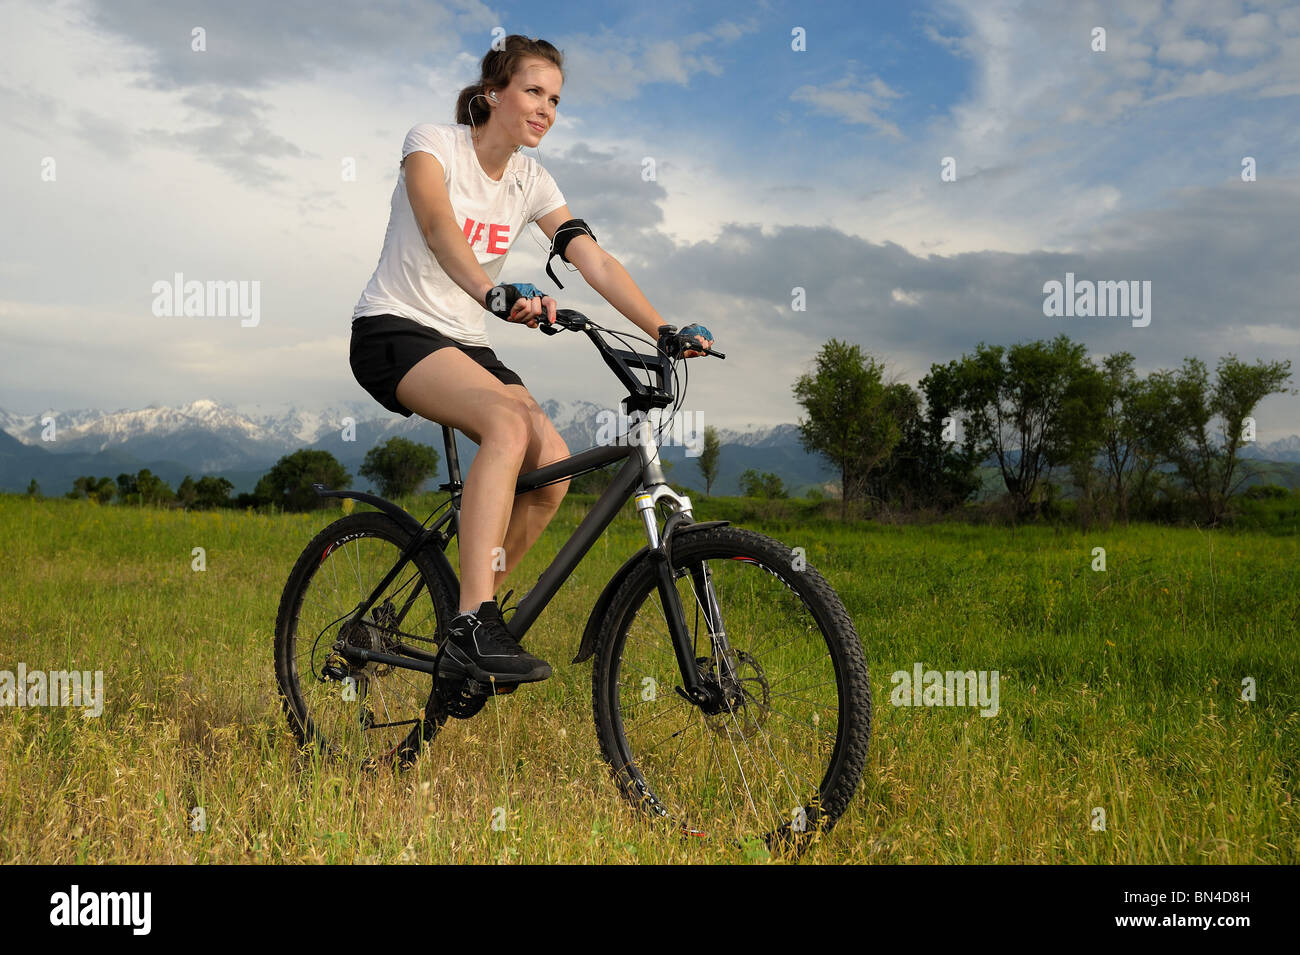 Chica montando una bicicleta Imagen De Stock